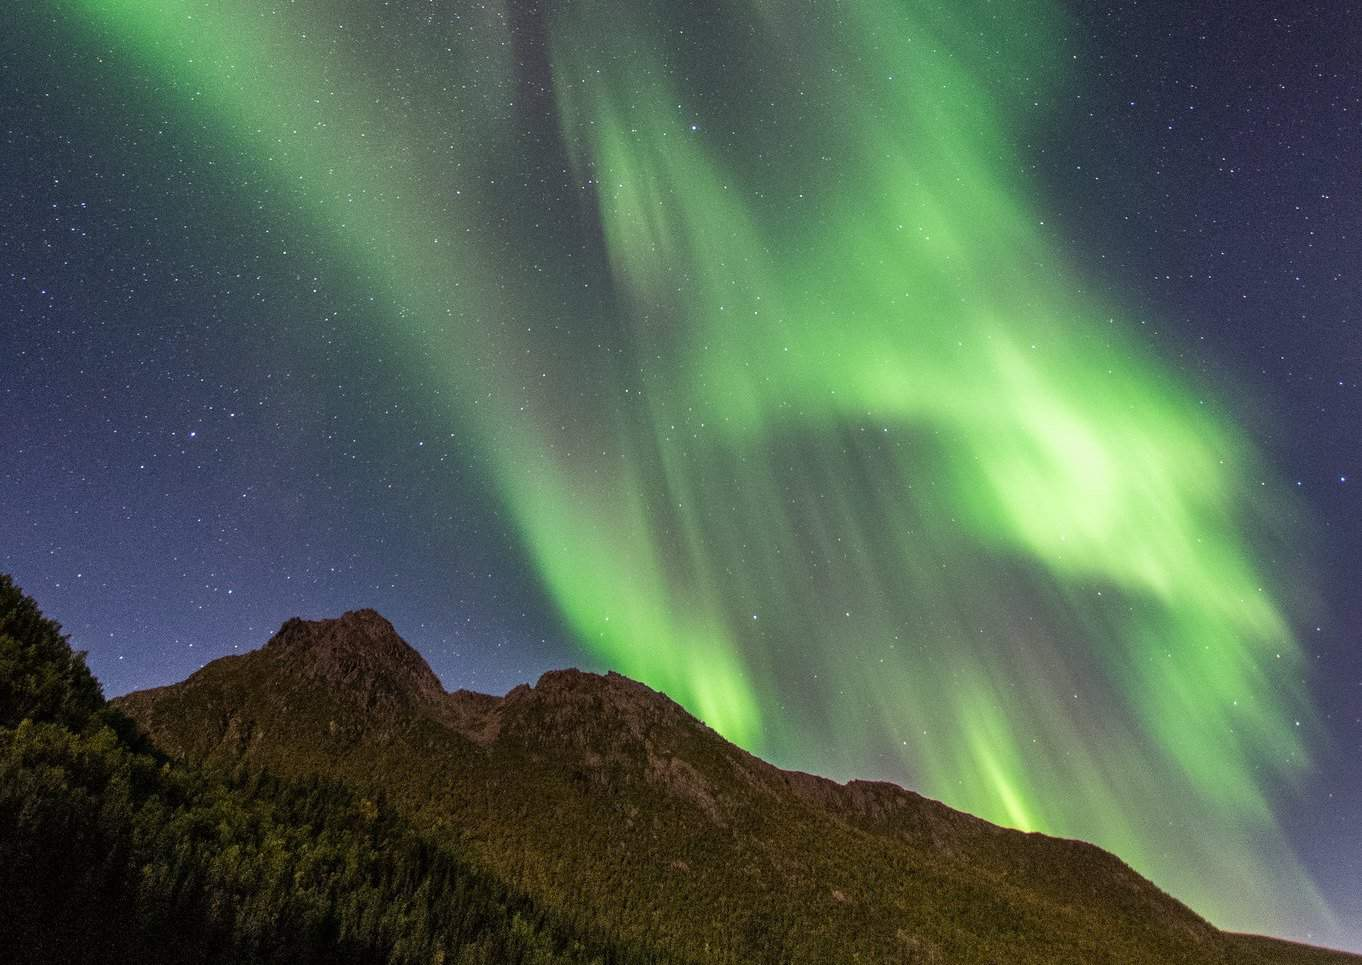 Northern Lights in Europe - Juho Holmi via Flickr